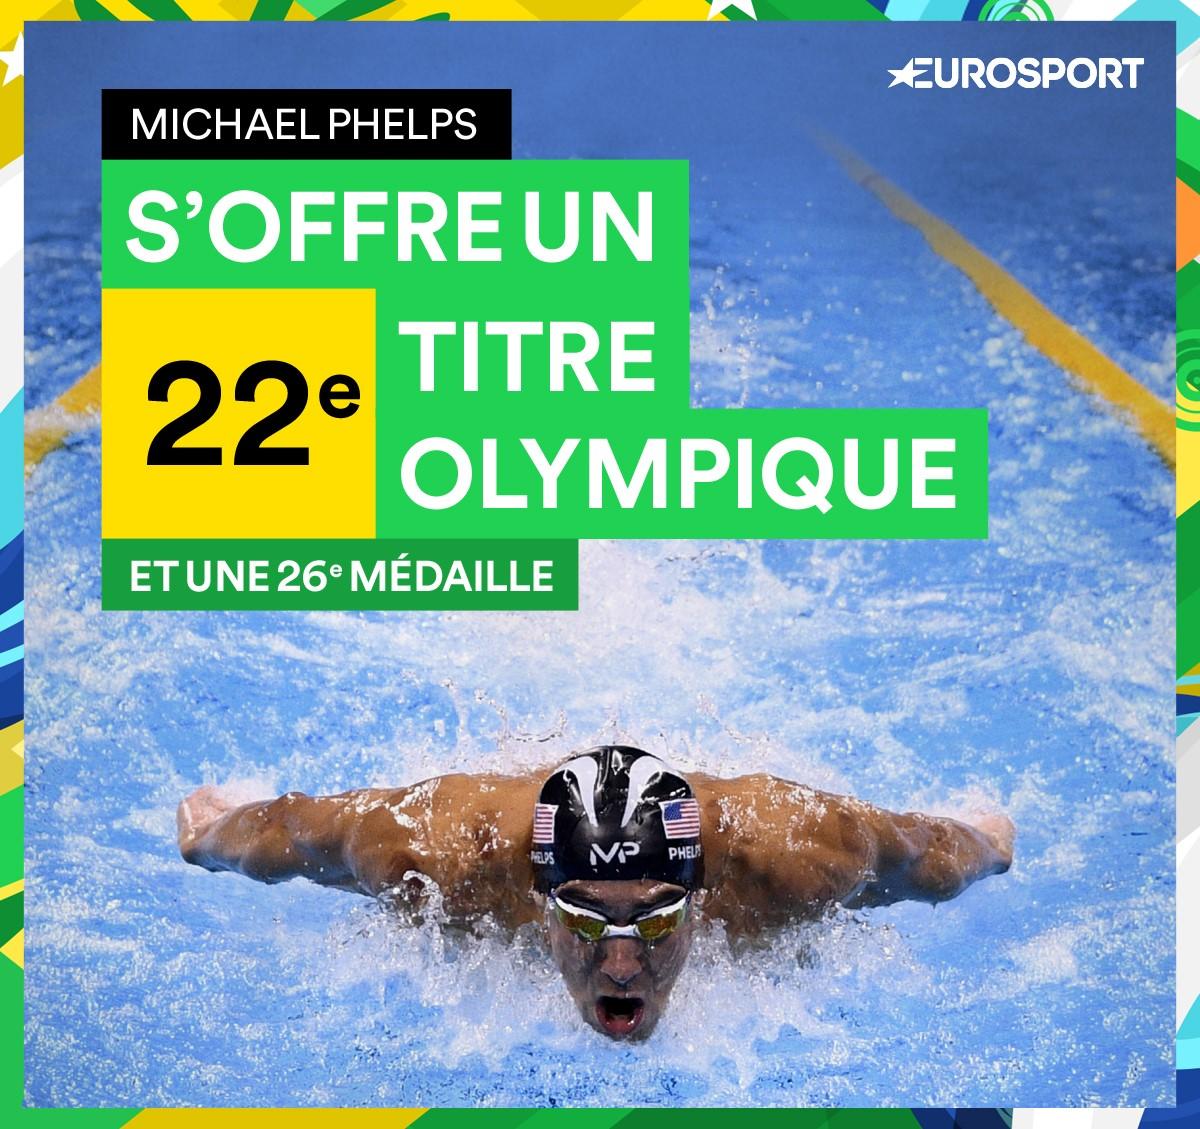 https://i.eurosport.com/2016/08/12/1909821.jpg